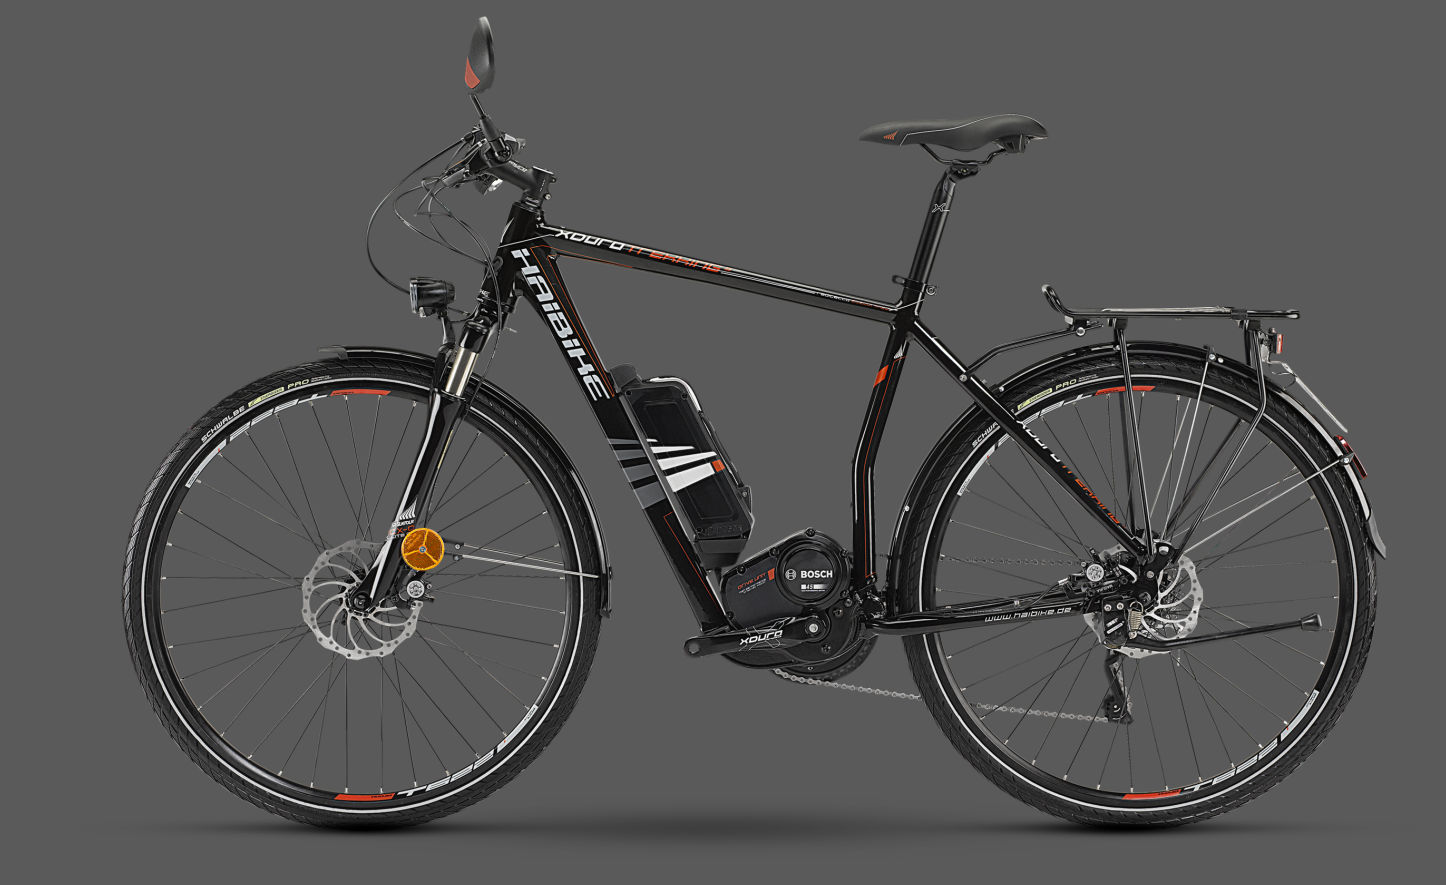 haibike eq xduro trekking s rowery katalog rowerowy. Black Bedroom Furniture Sets. Home Design Ideas